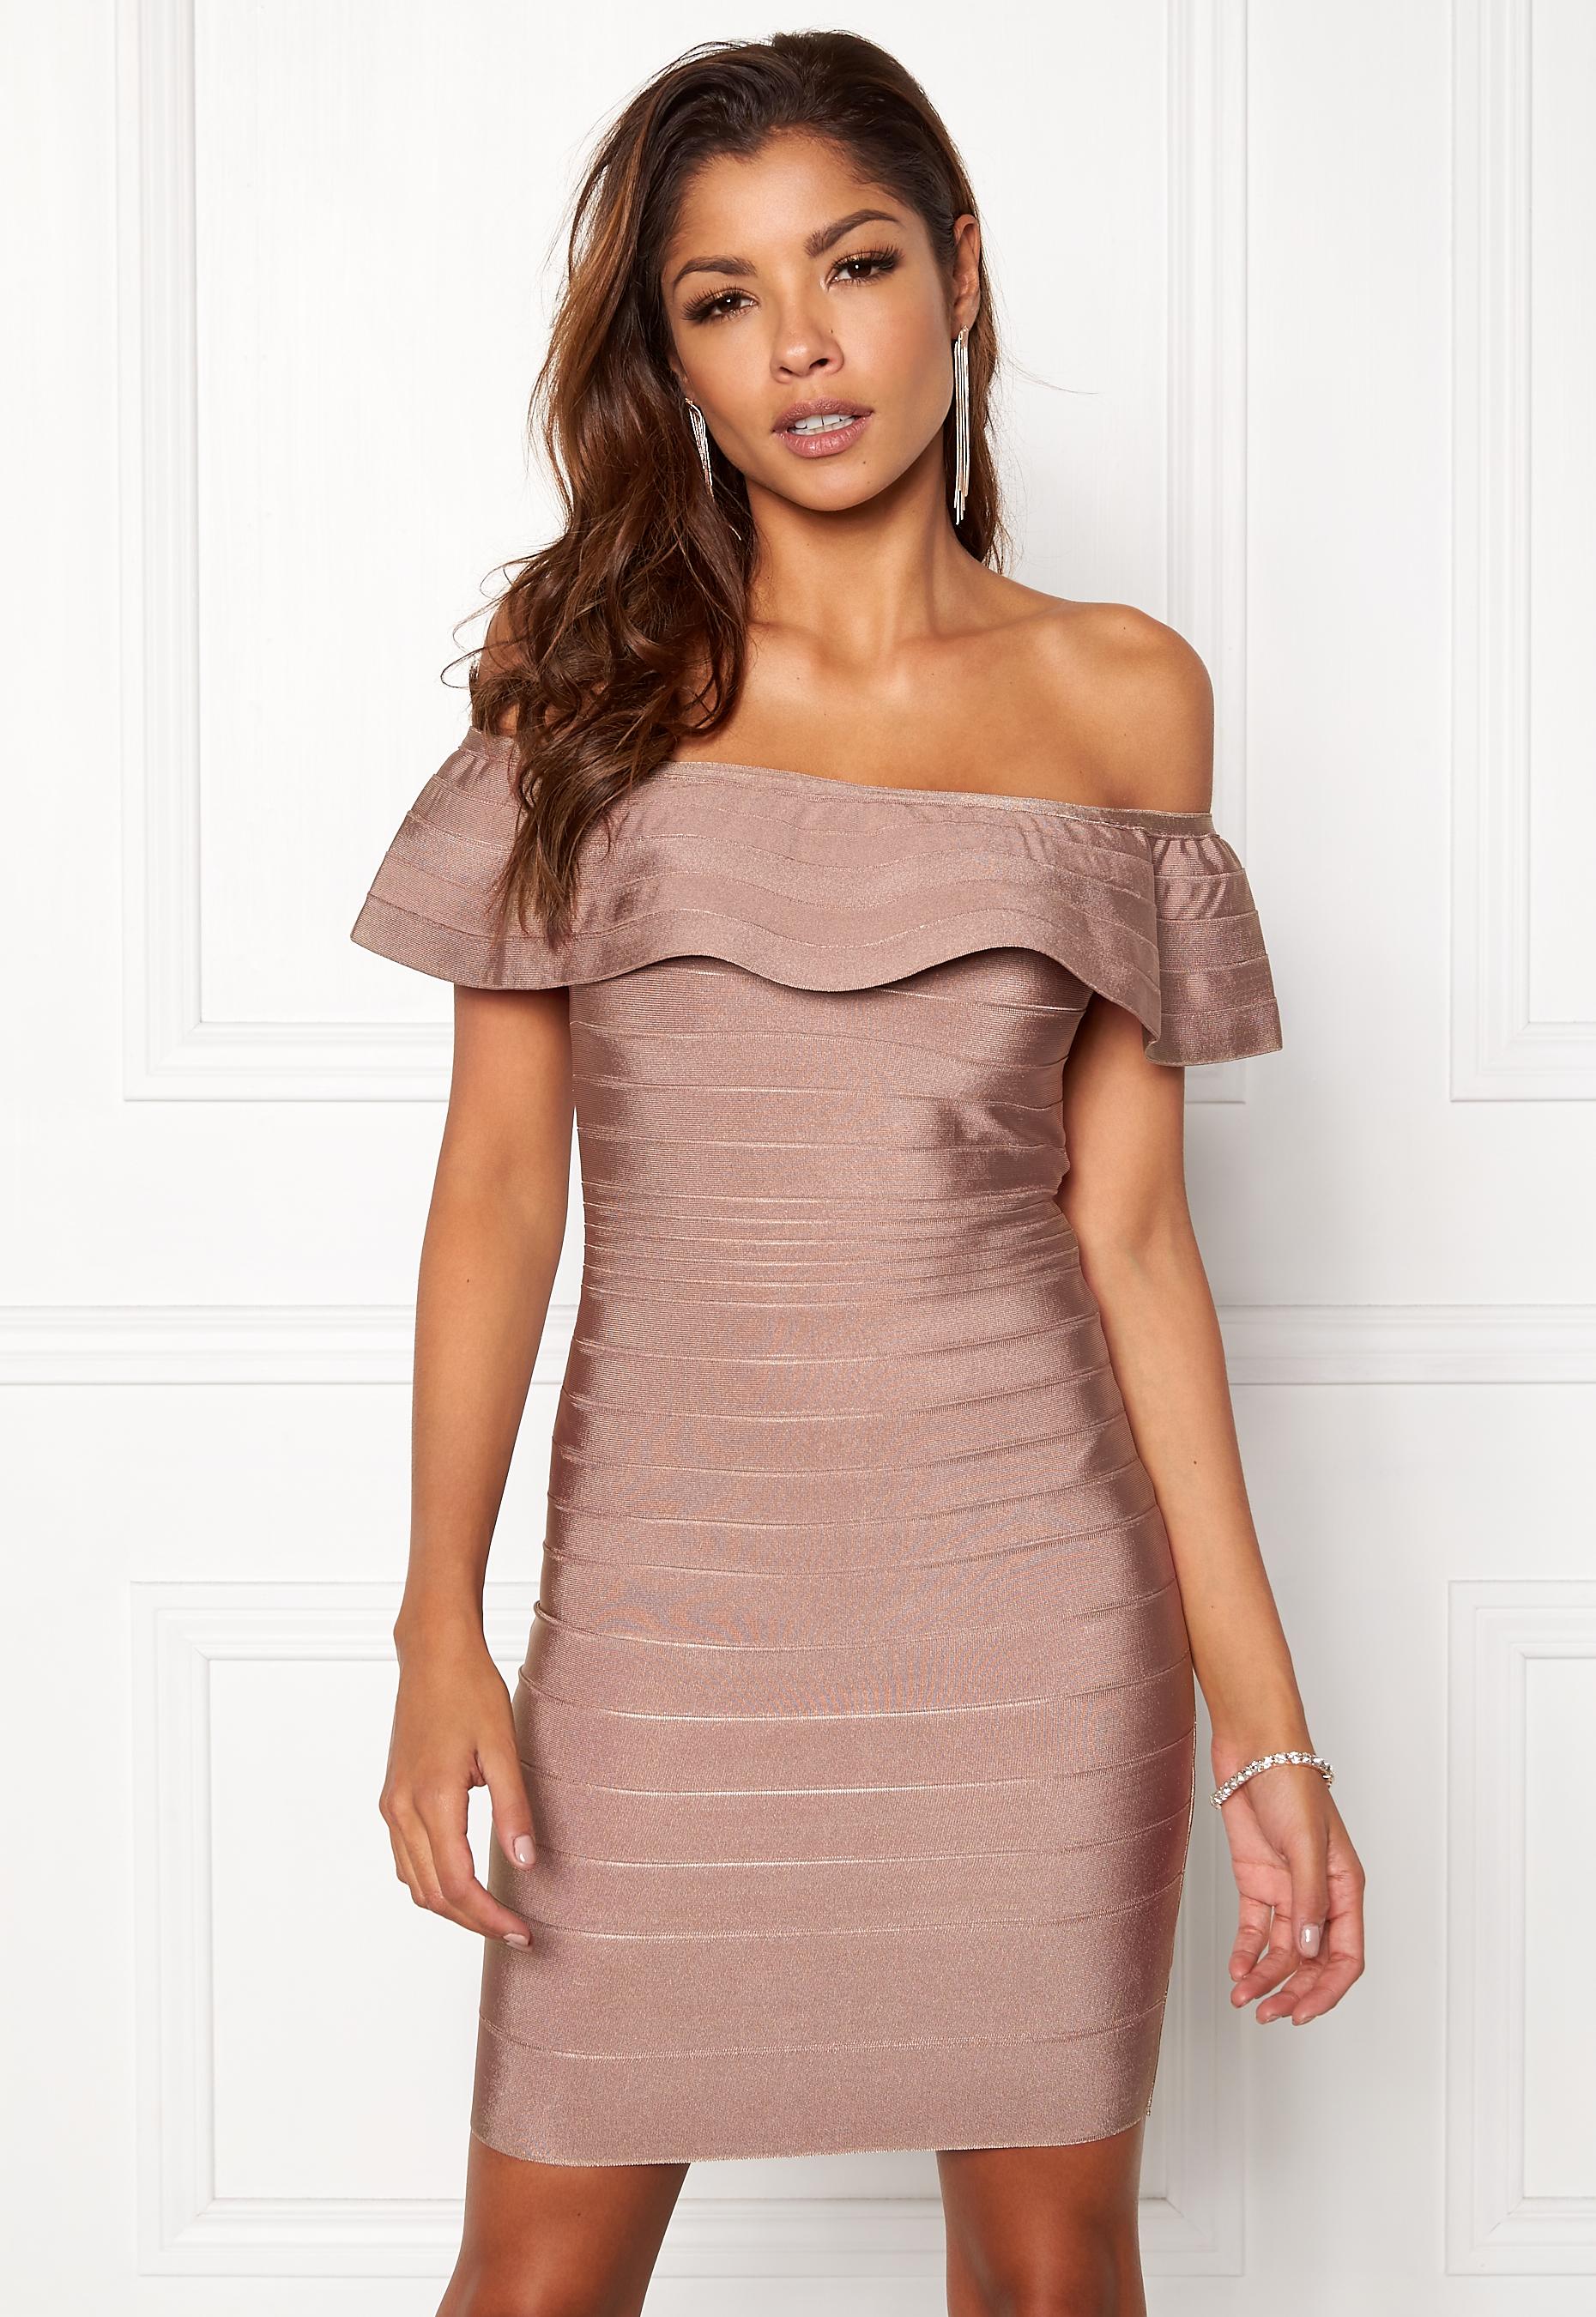 bf42596e WOW COUTURE Sonnet Bandage Mini Dress Almond - Bubbleroom